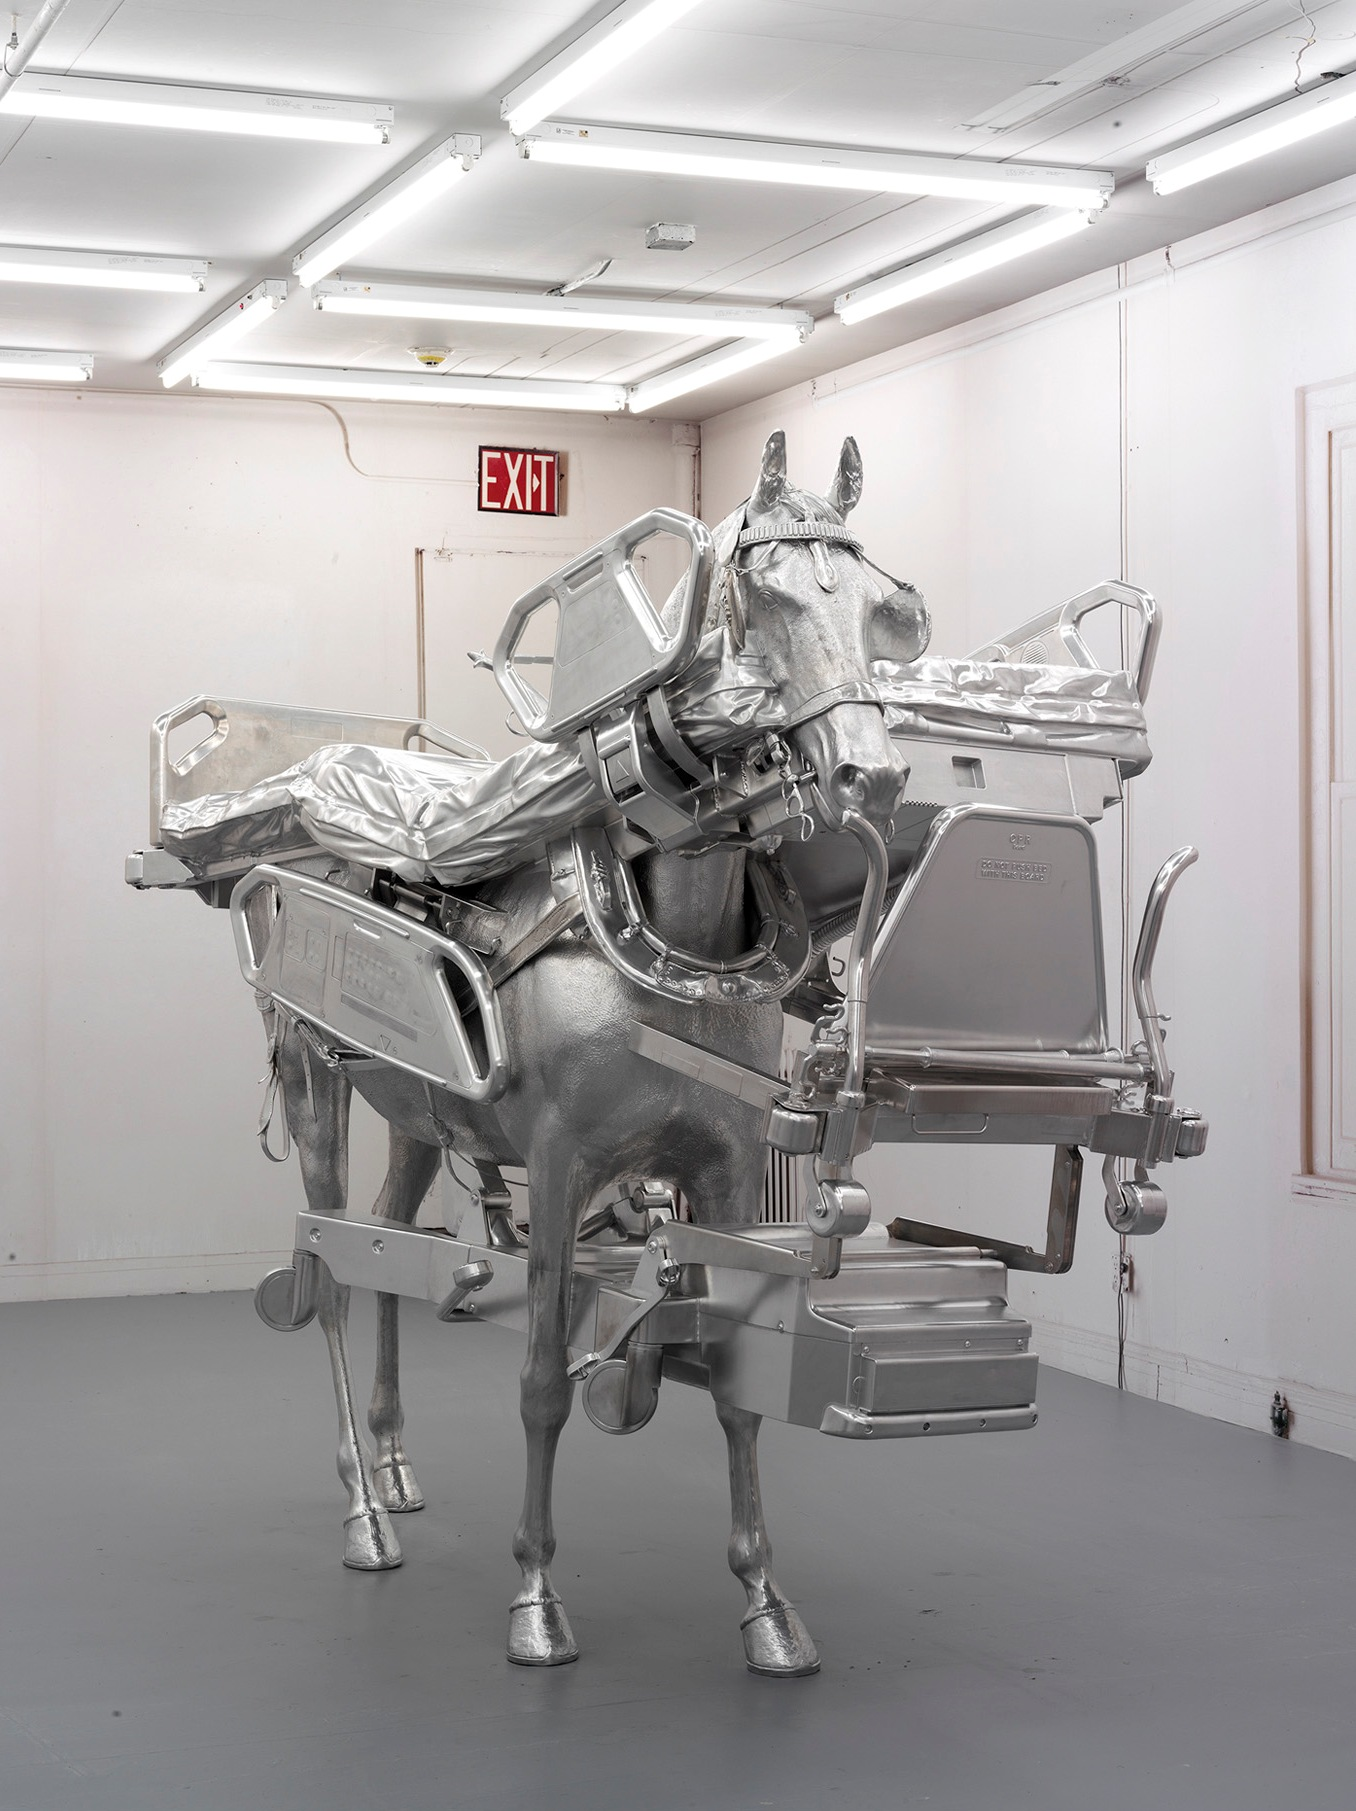 Urs Fischer, Horse/Bed, 2013, Milled aluminum, galavanized steel, screws, bolts, two component resin 85 7/8 x 103 9/16 x 43 3/4 inches (218.2 x 263.1 x 111.1 cm) Edition of 3 & 1 AP. © Urs Fischer. Courtesy dell'artista e Gagosian Gallery. Foto: Stefan Altenburger